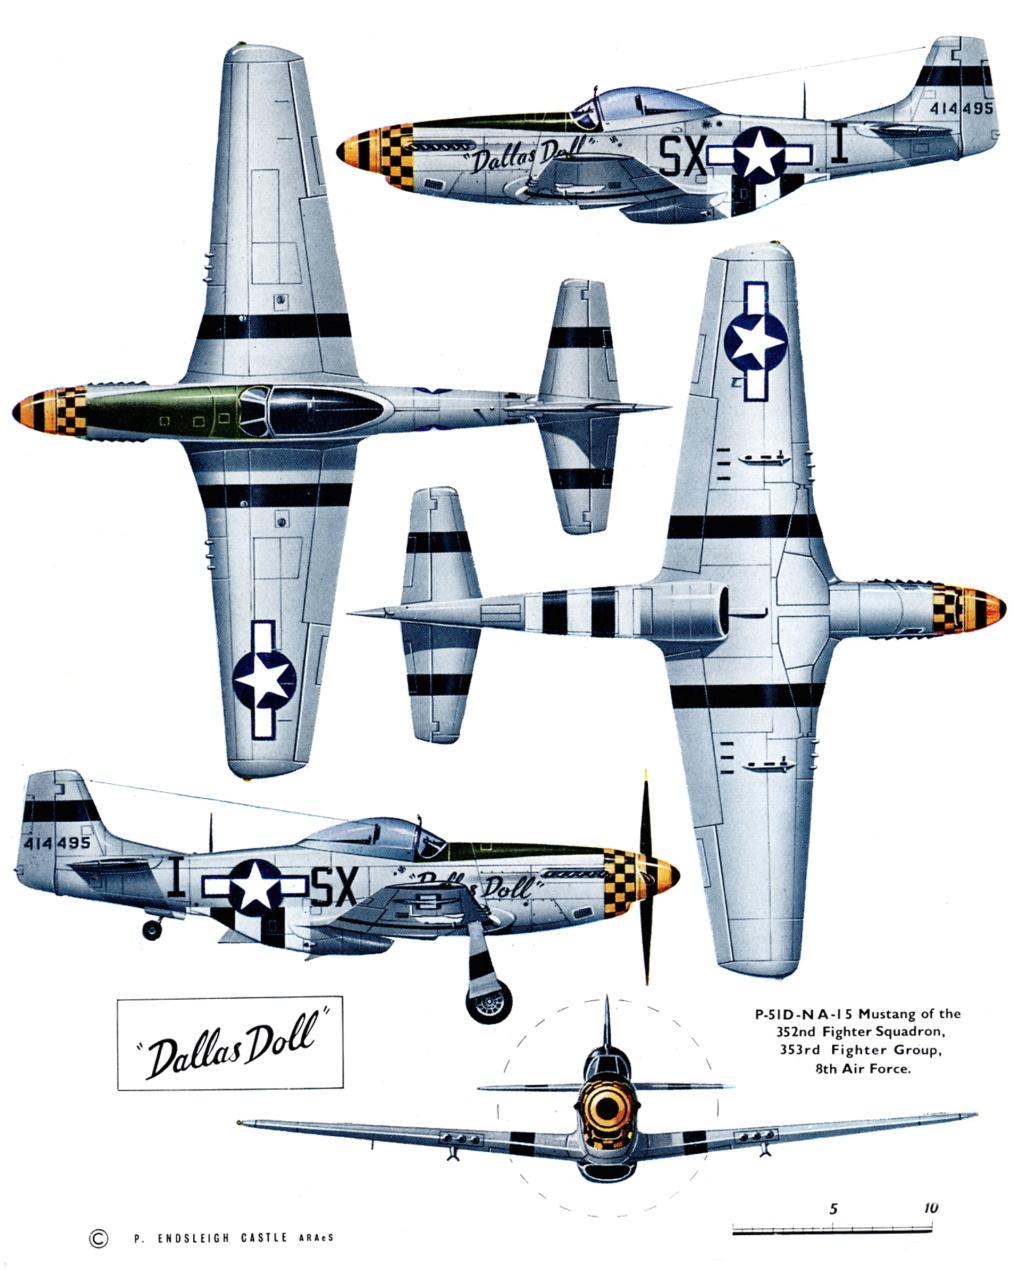 NORTH AMERICAN P-51 MUSTANG P-51d-10